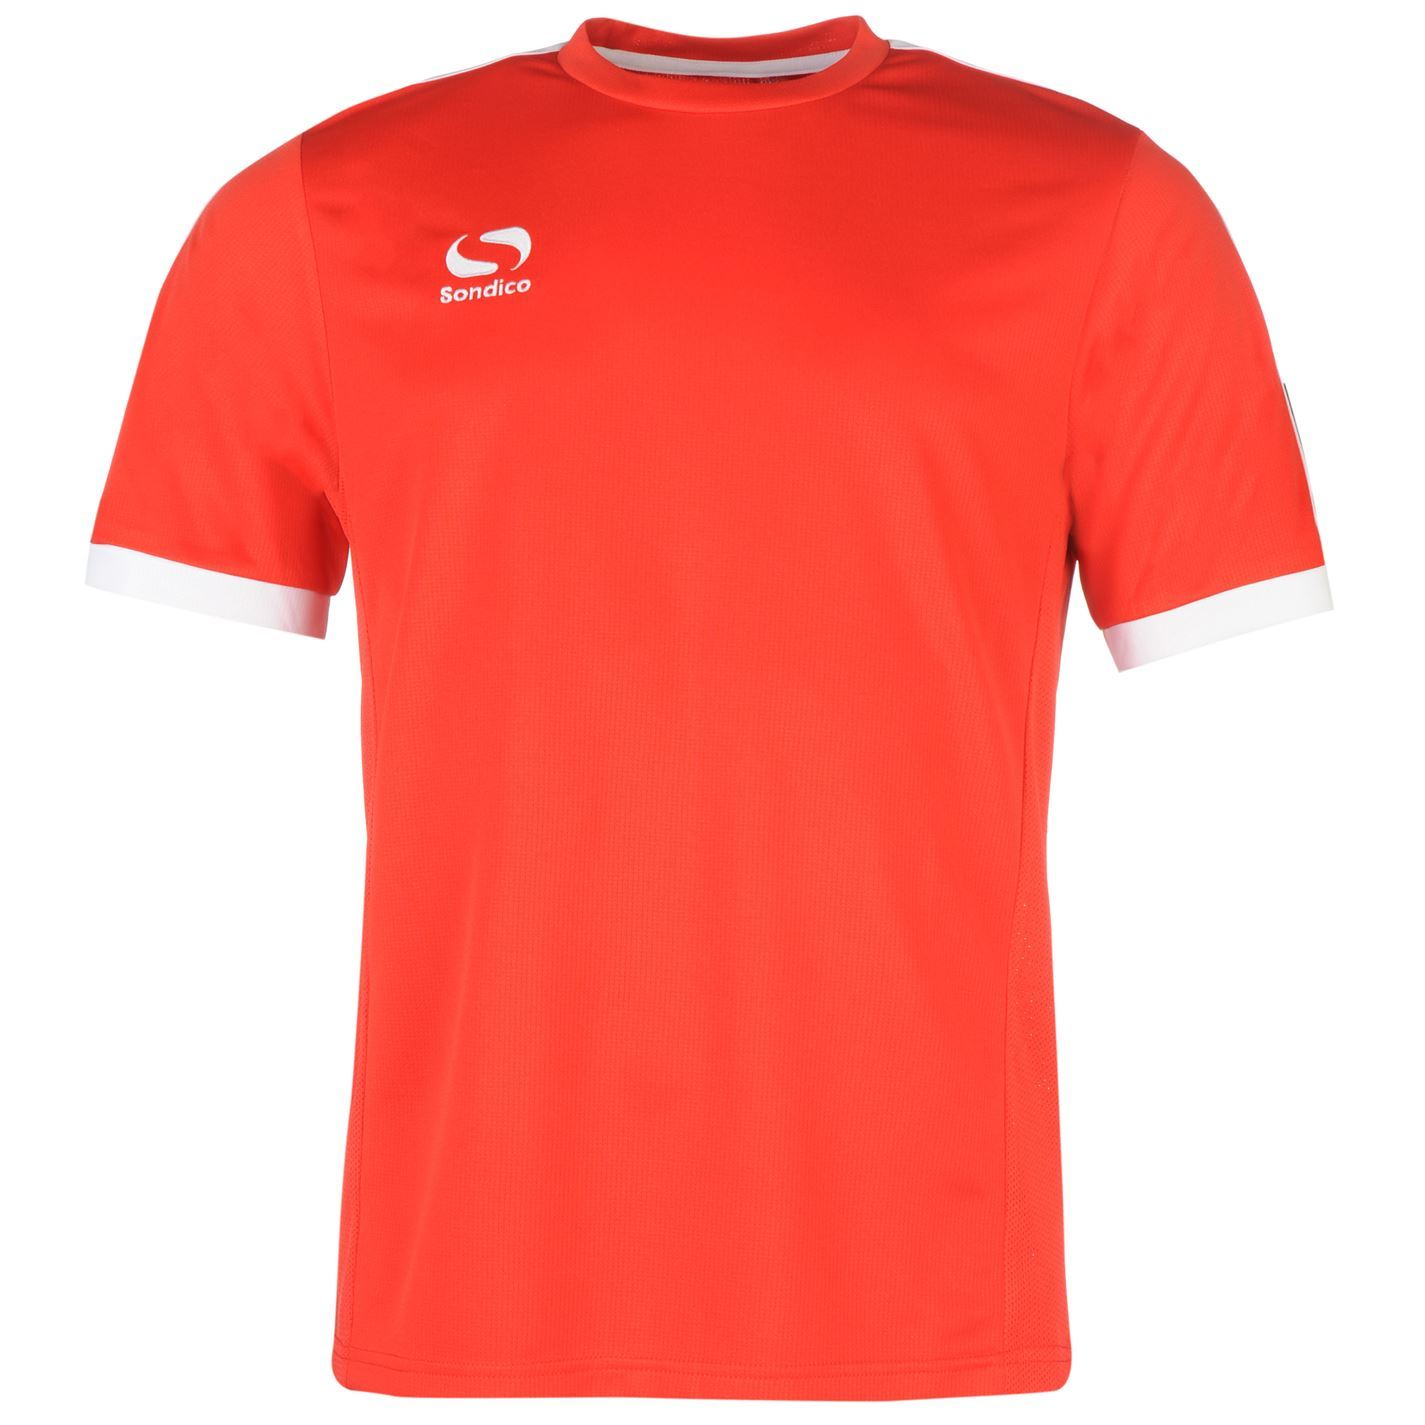 056b3ea75bb Red And White T Shirt Ebay - DREAMWORKS